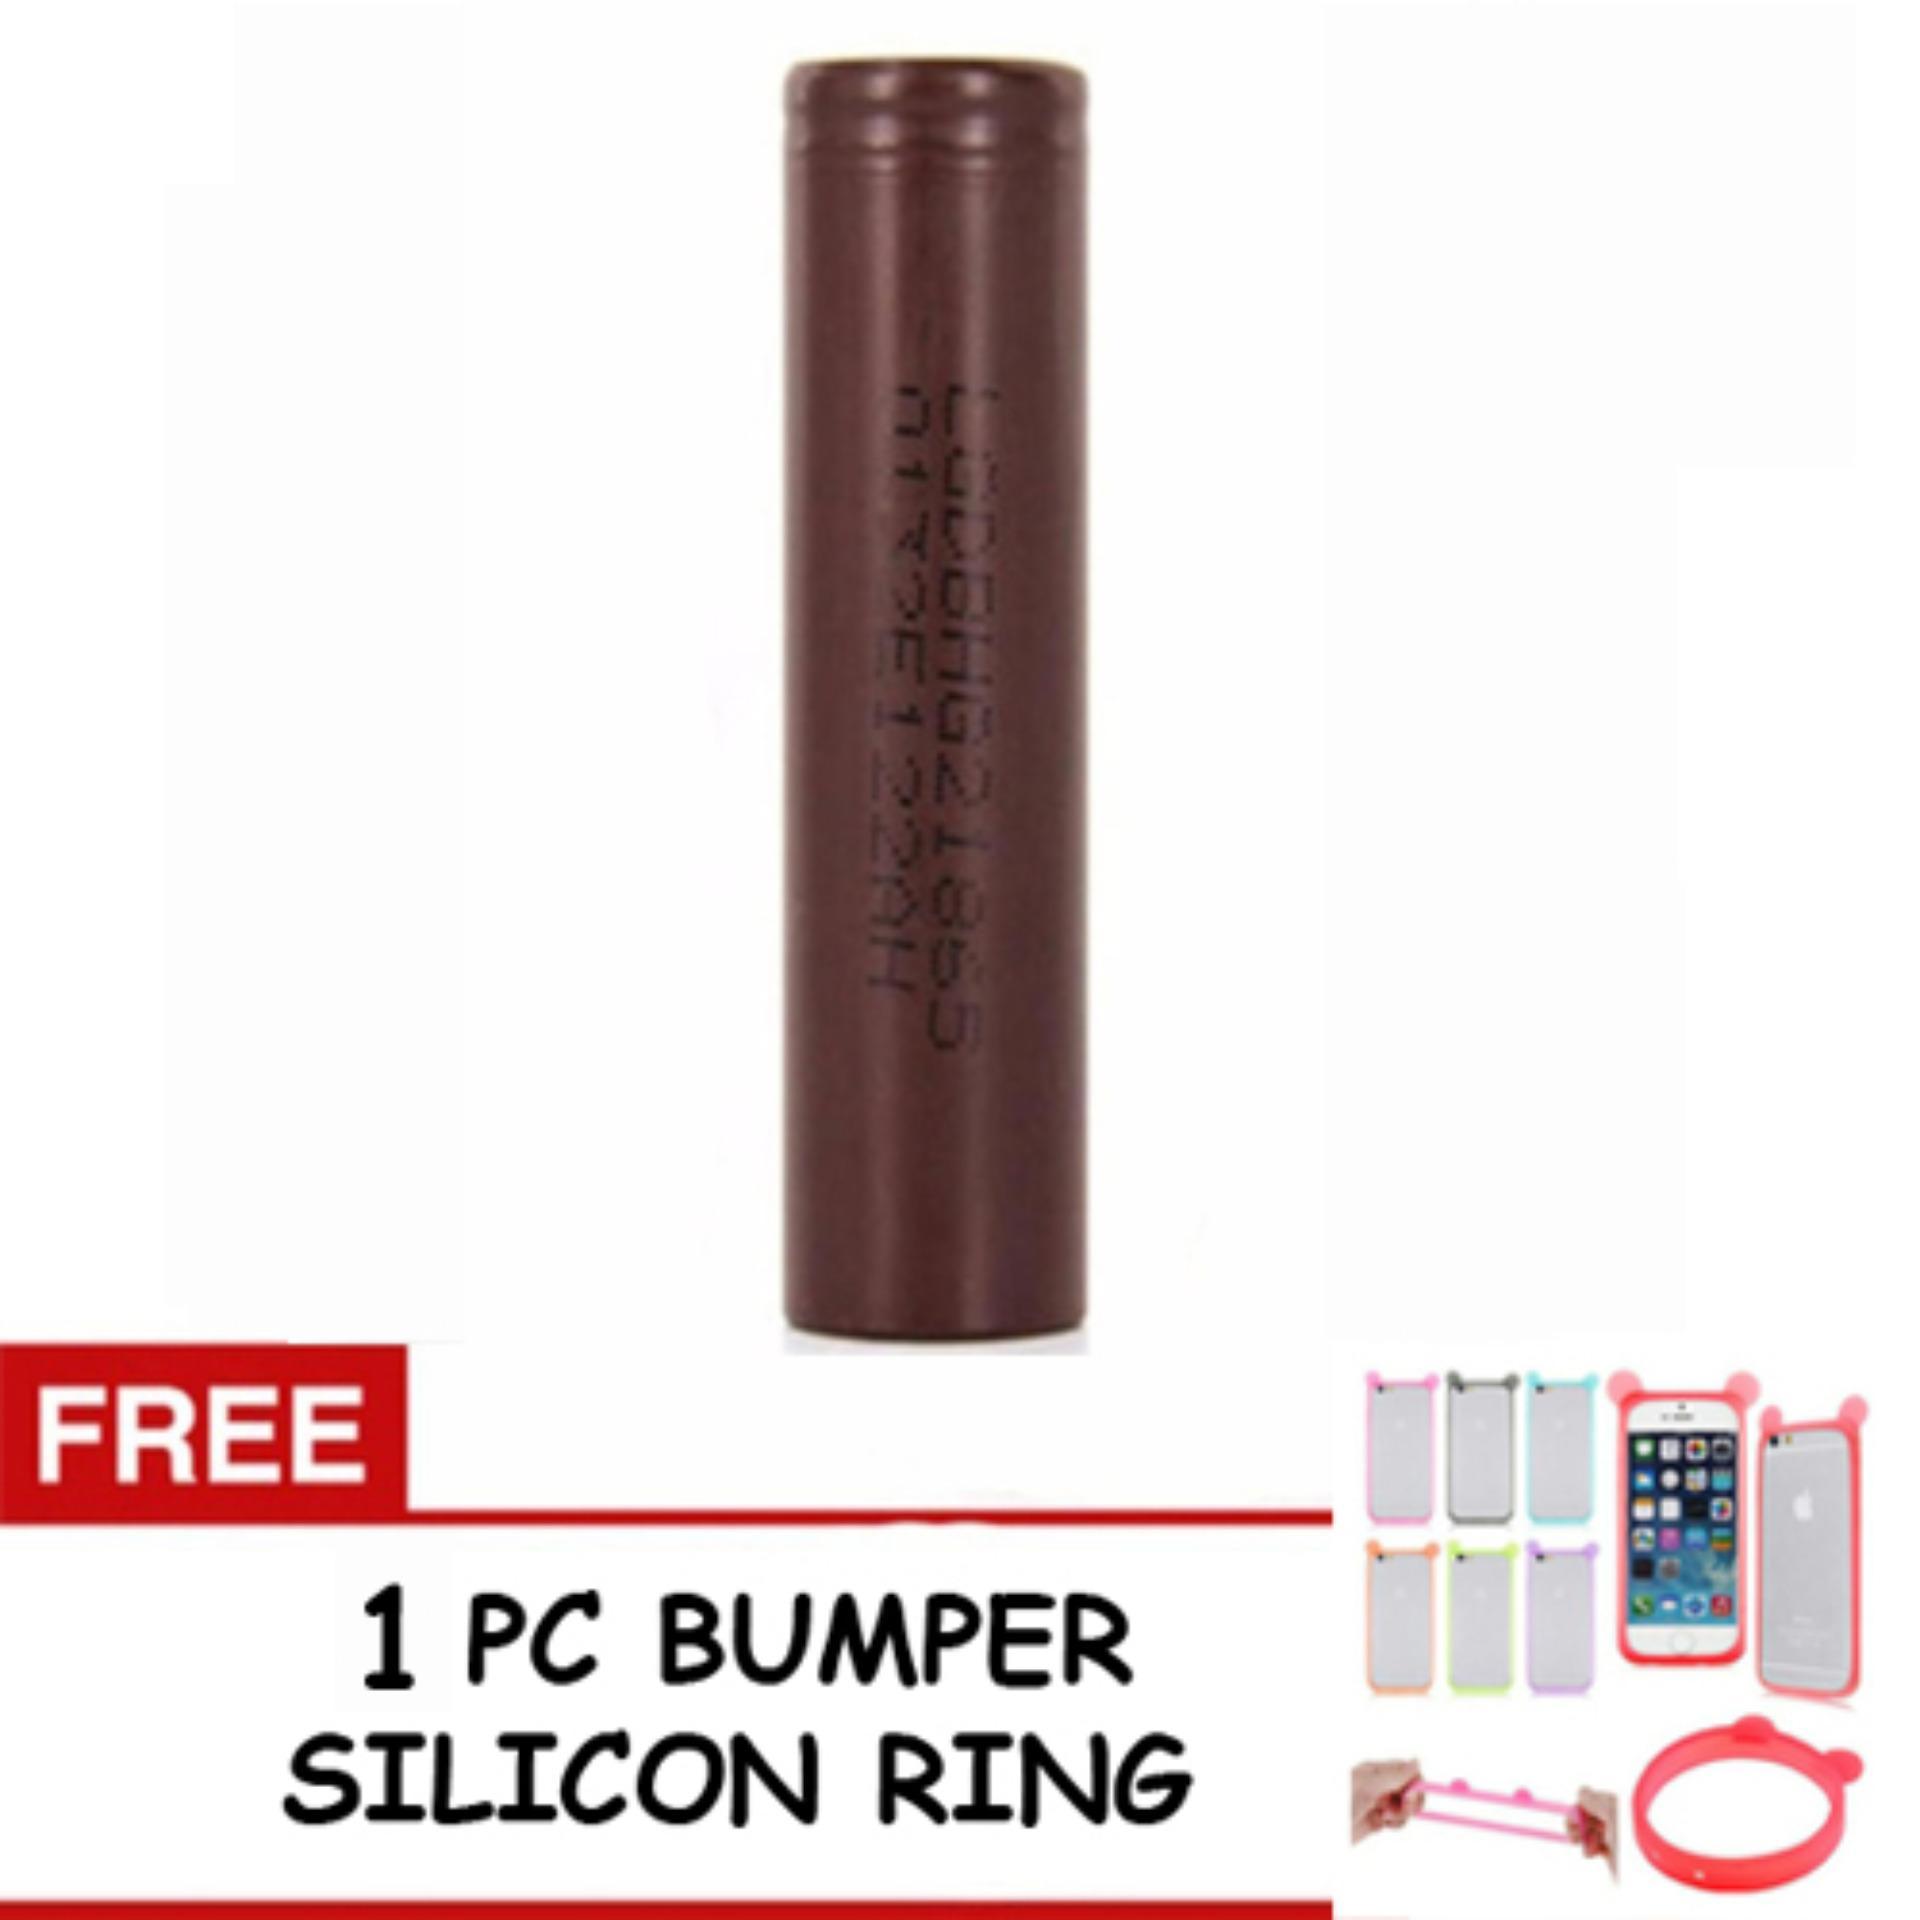 Price Checker LG Baterai Rokok Elektrik Mods Vape Vapor 18650 3000 mAh Coklat + FREE 1